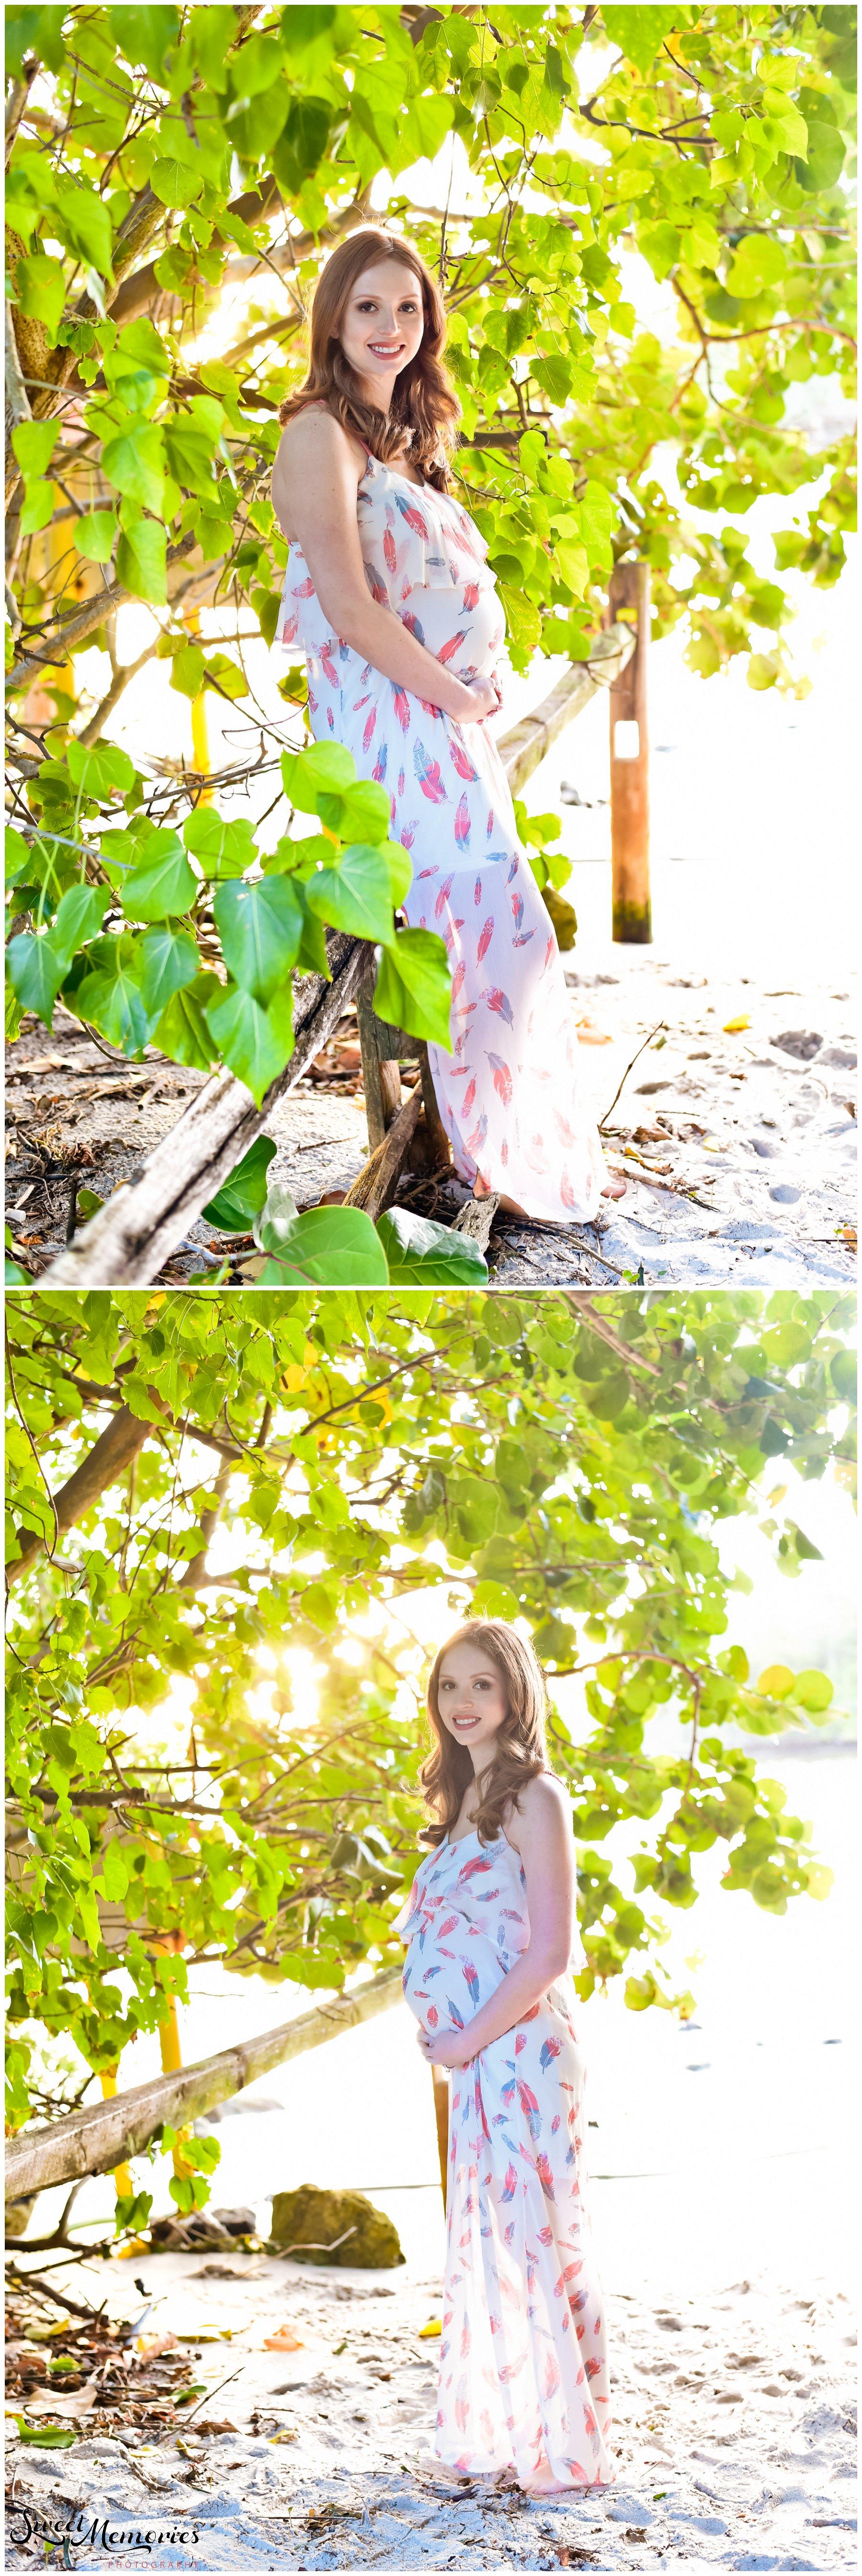 Maternity Session at Spanish River Park - Boca Raton Family Photographer